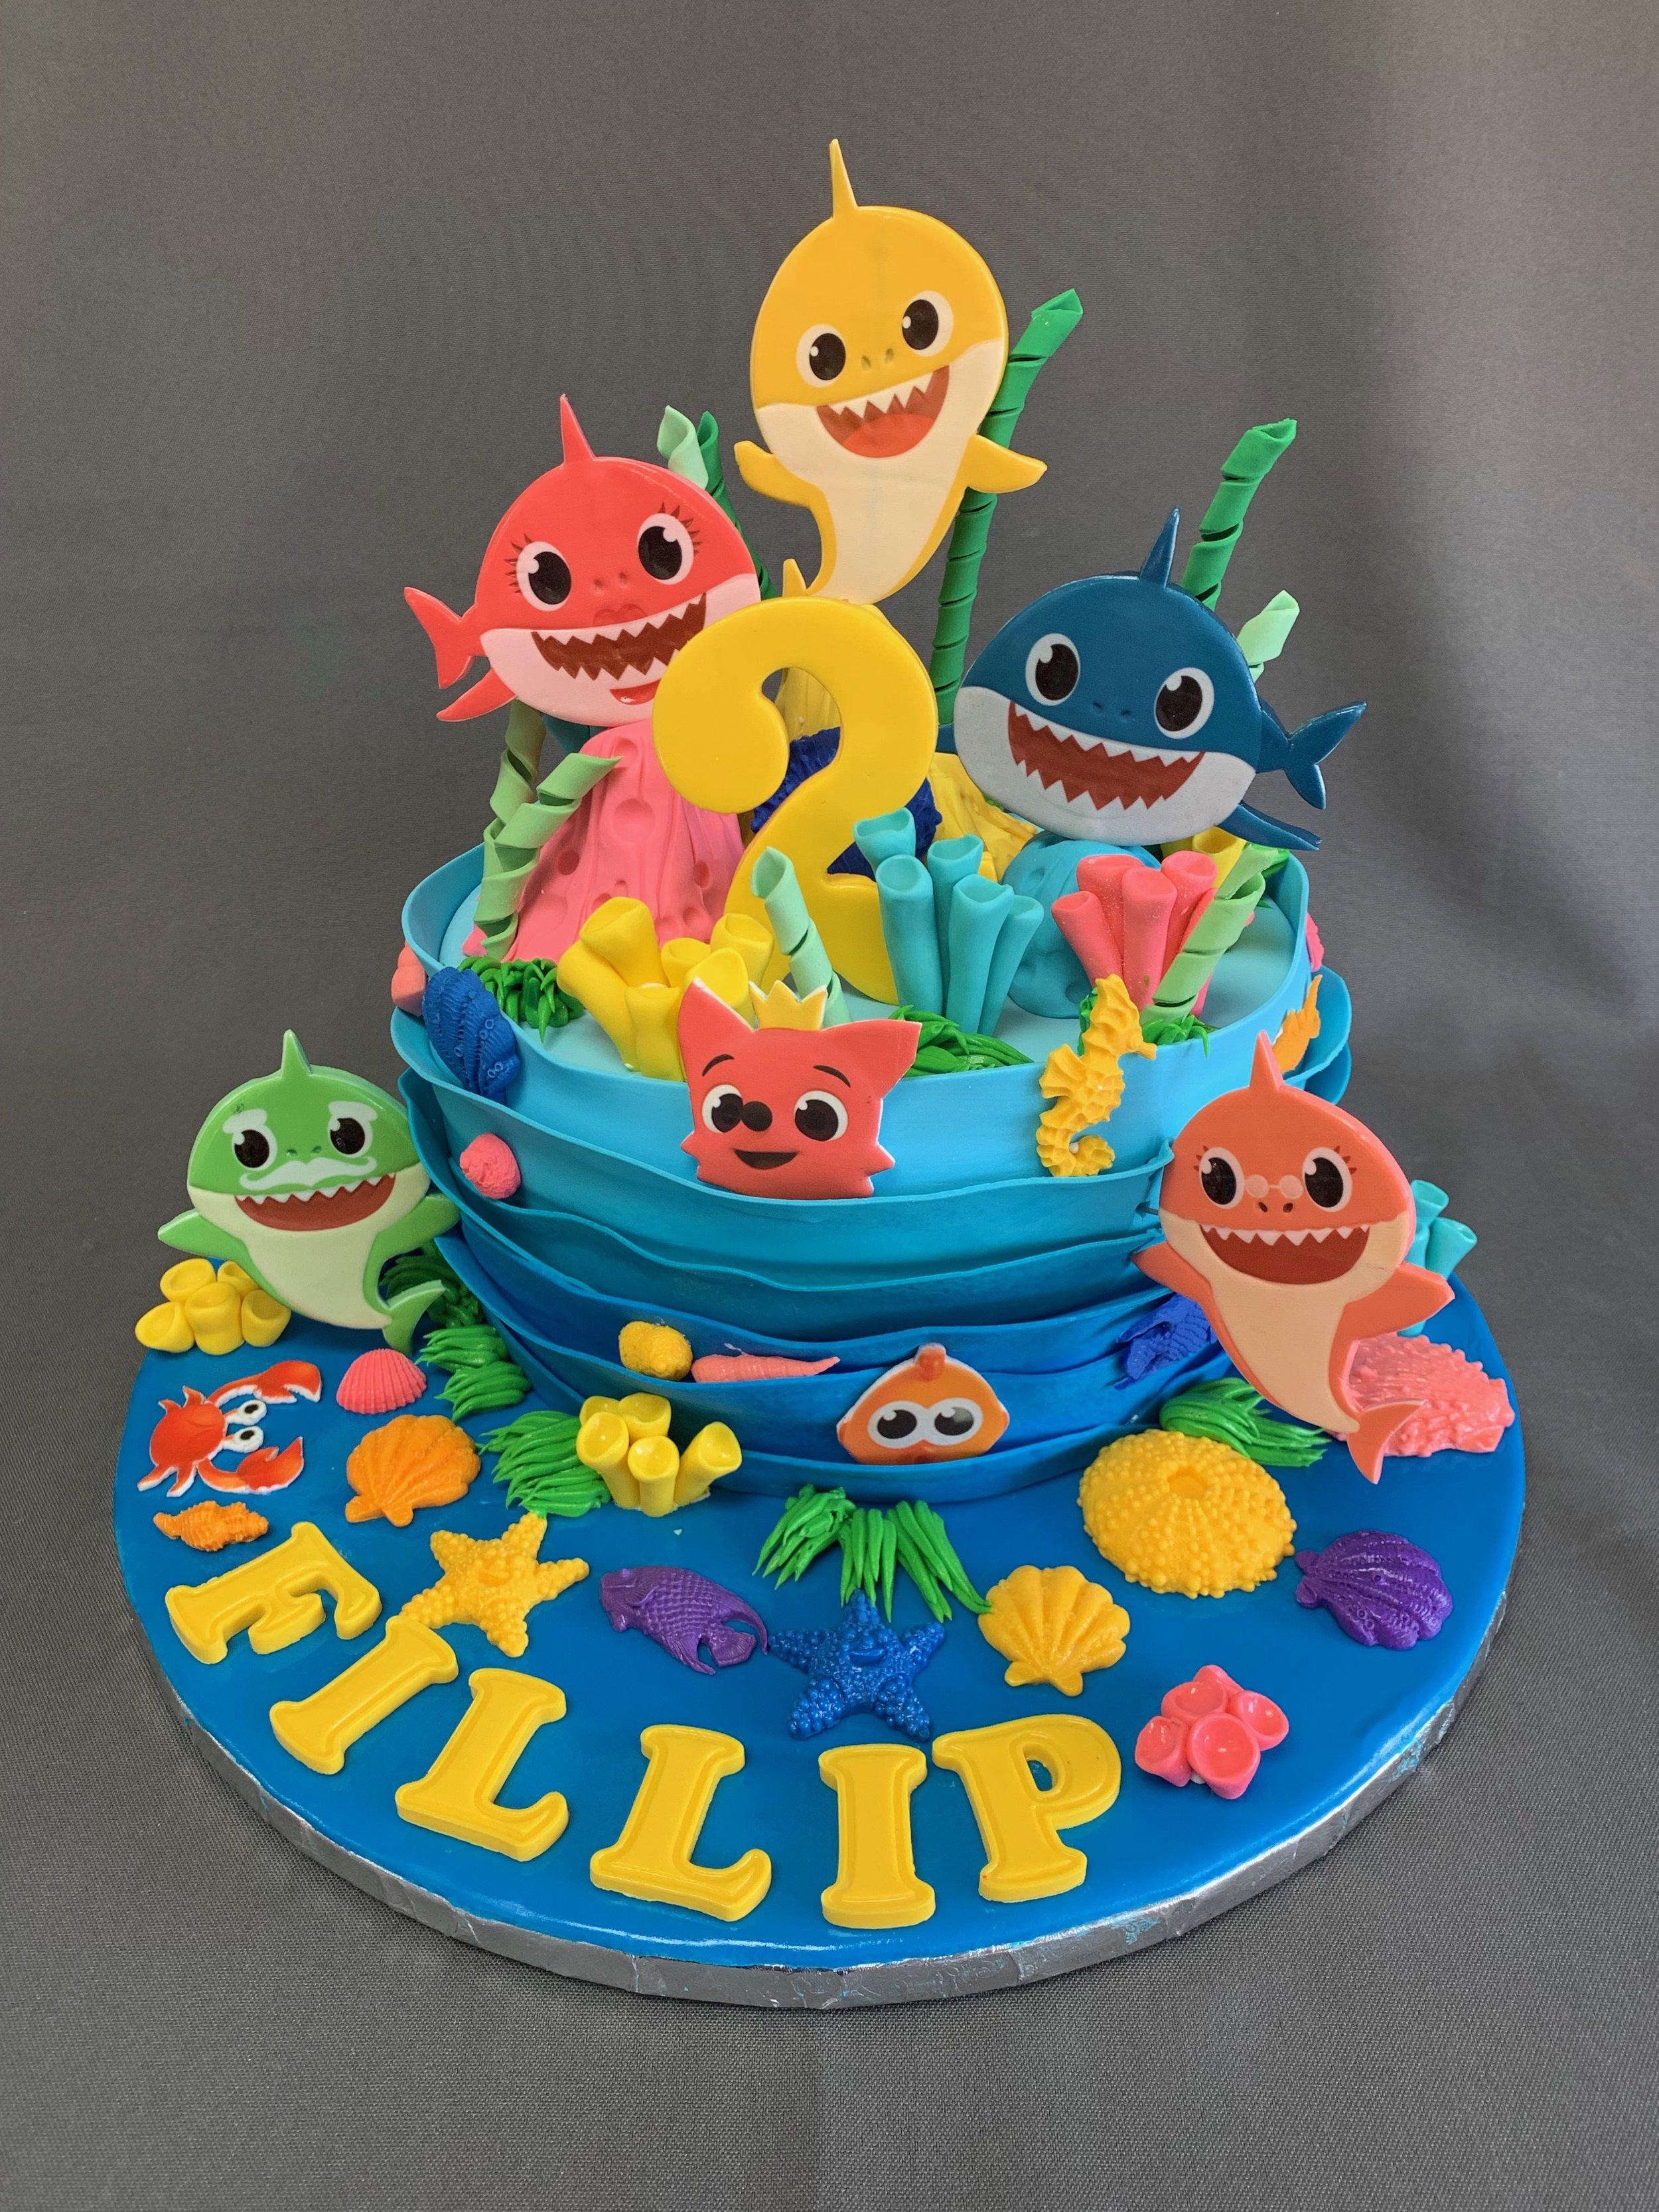 Baby Shark Birthday Cake Skazka Desserts Bakery Nj Custom Birthday Cakes Cupcakes Shop